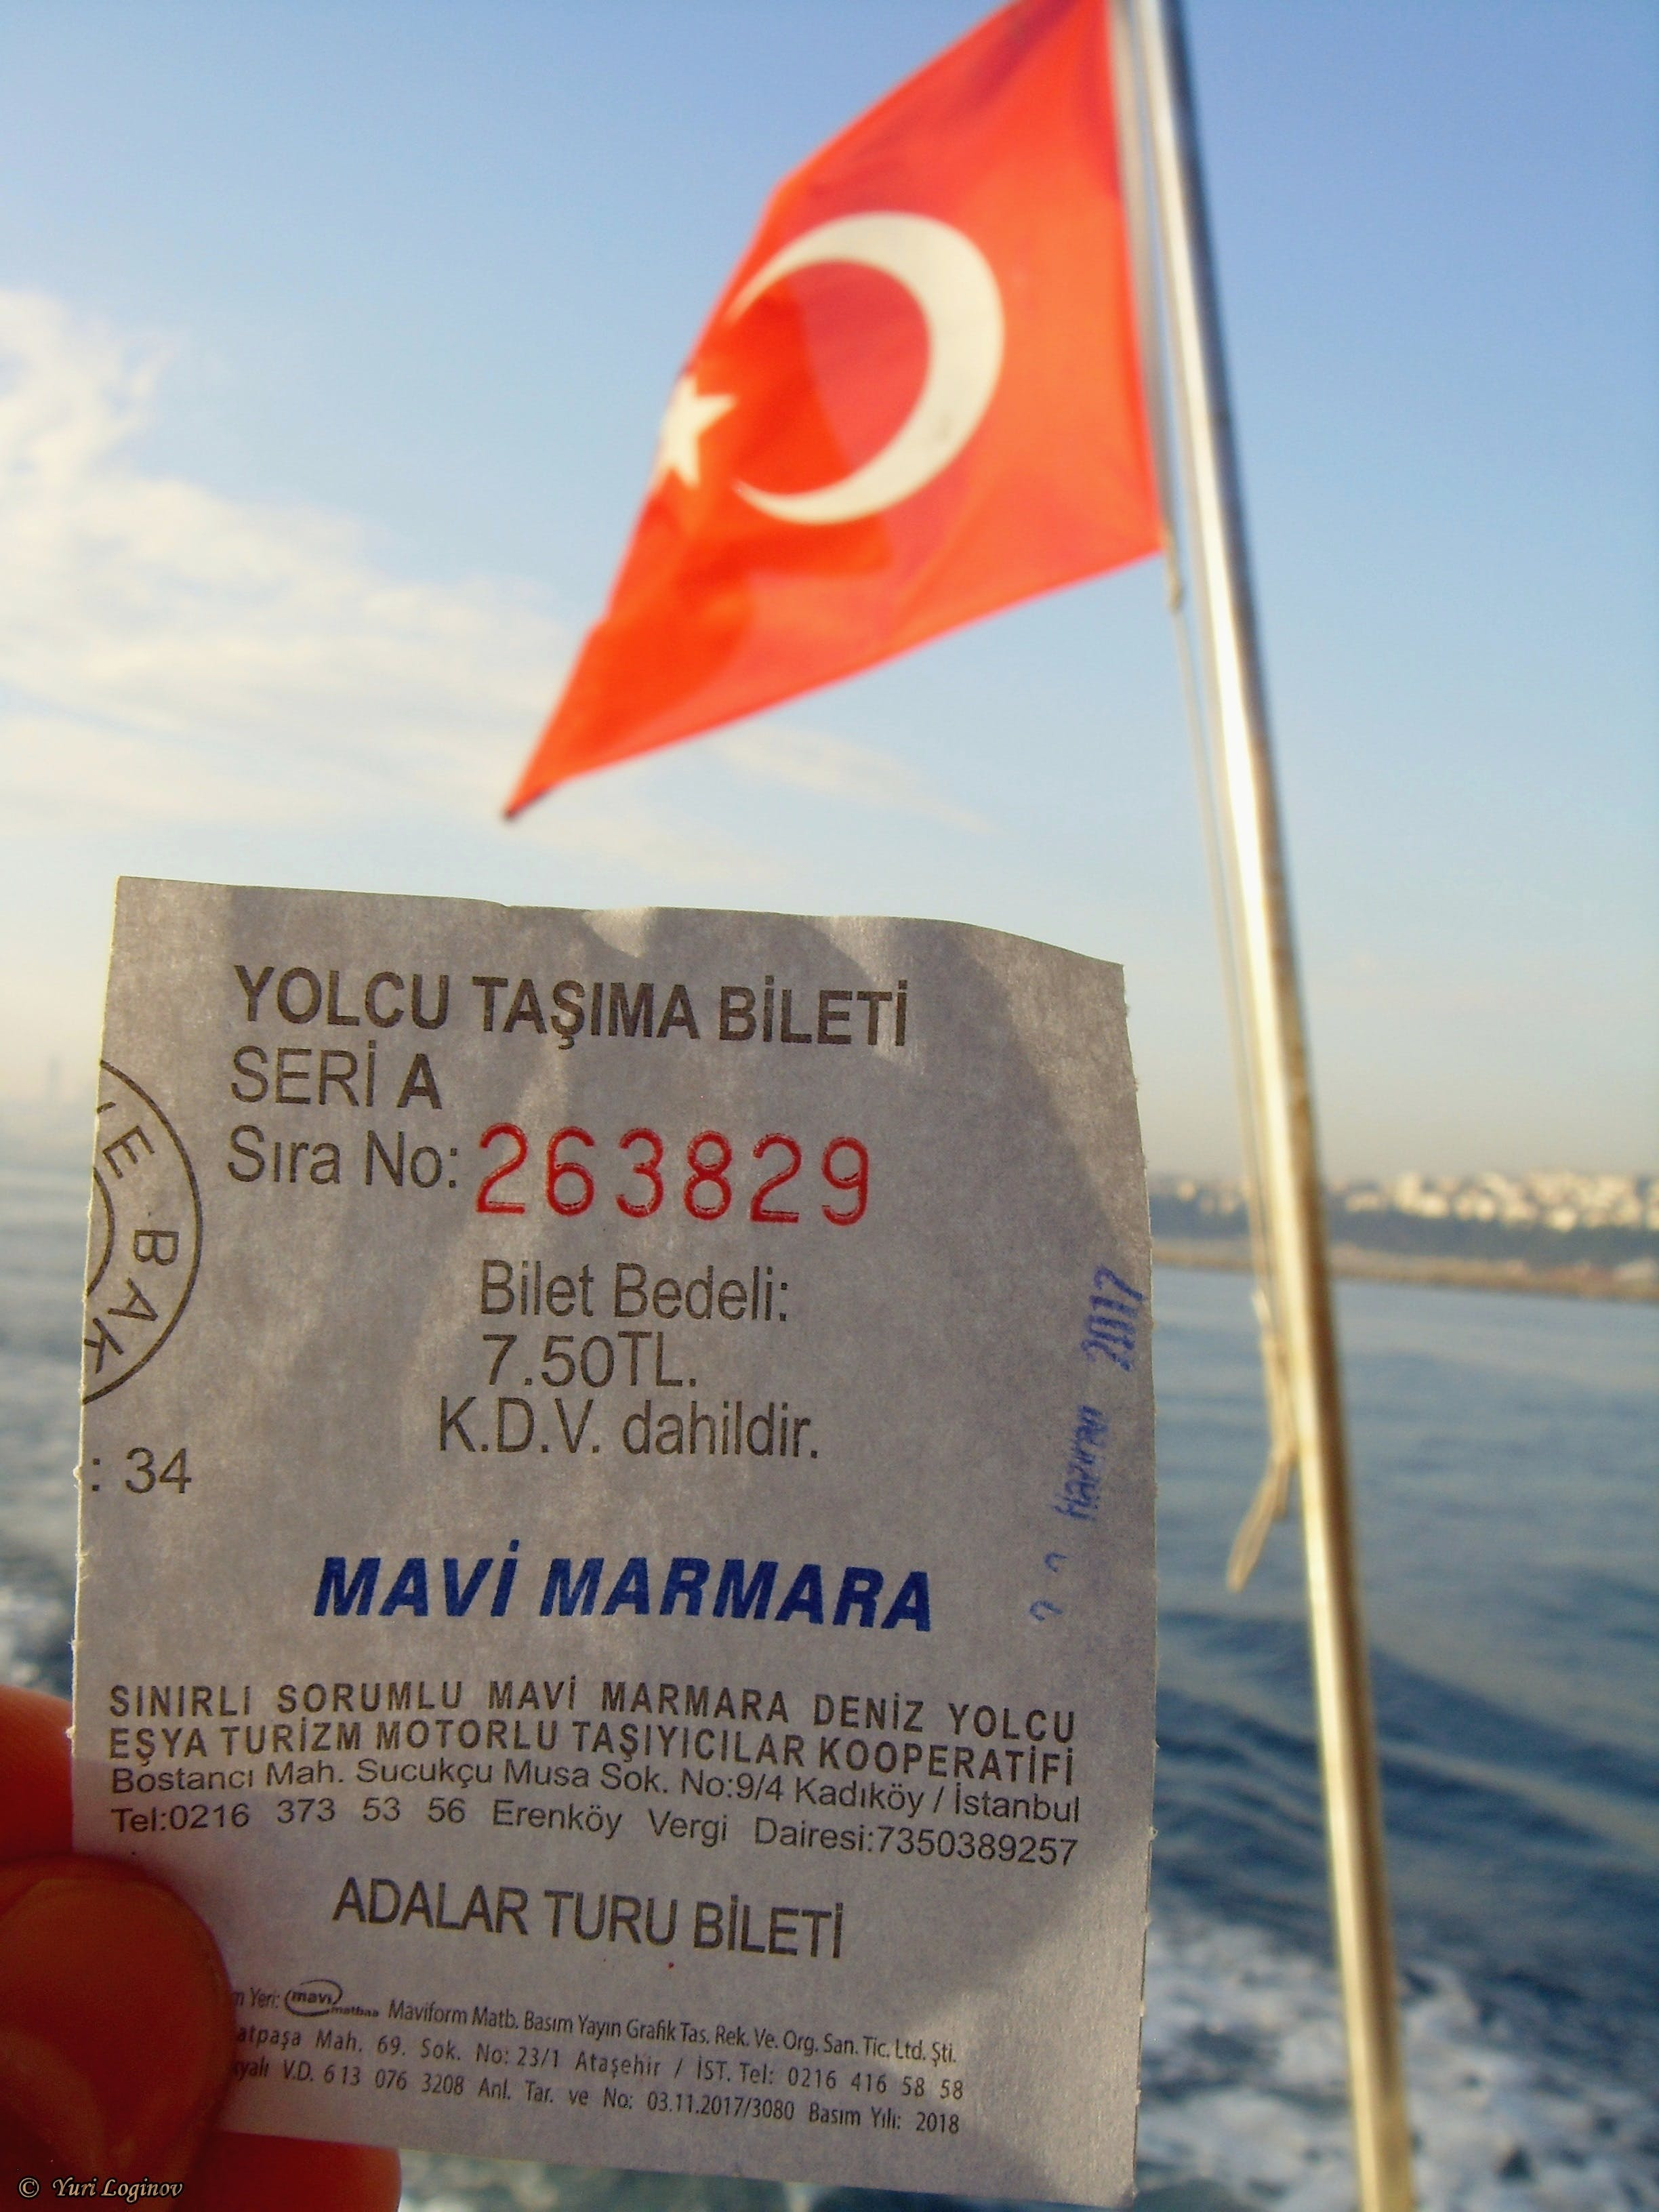 Free stock photo of turkey, Istanbul, TÃœRKÄ°YE, bosphorus